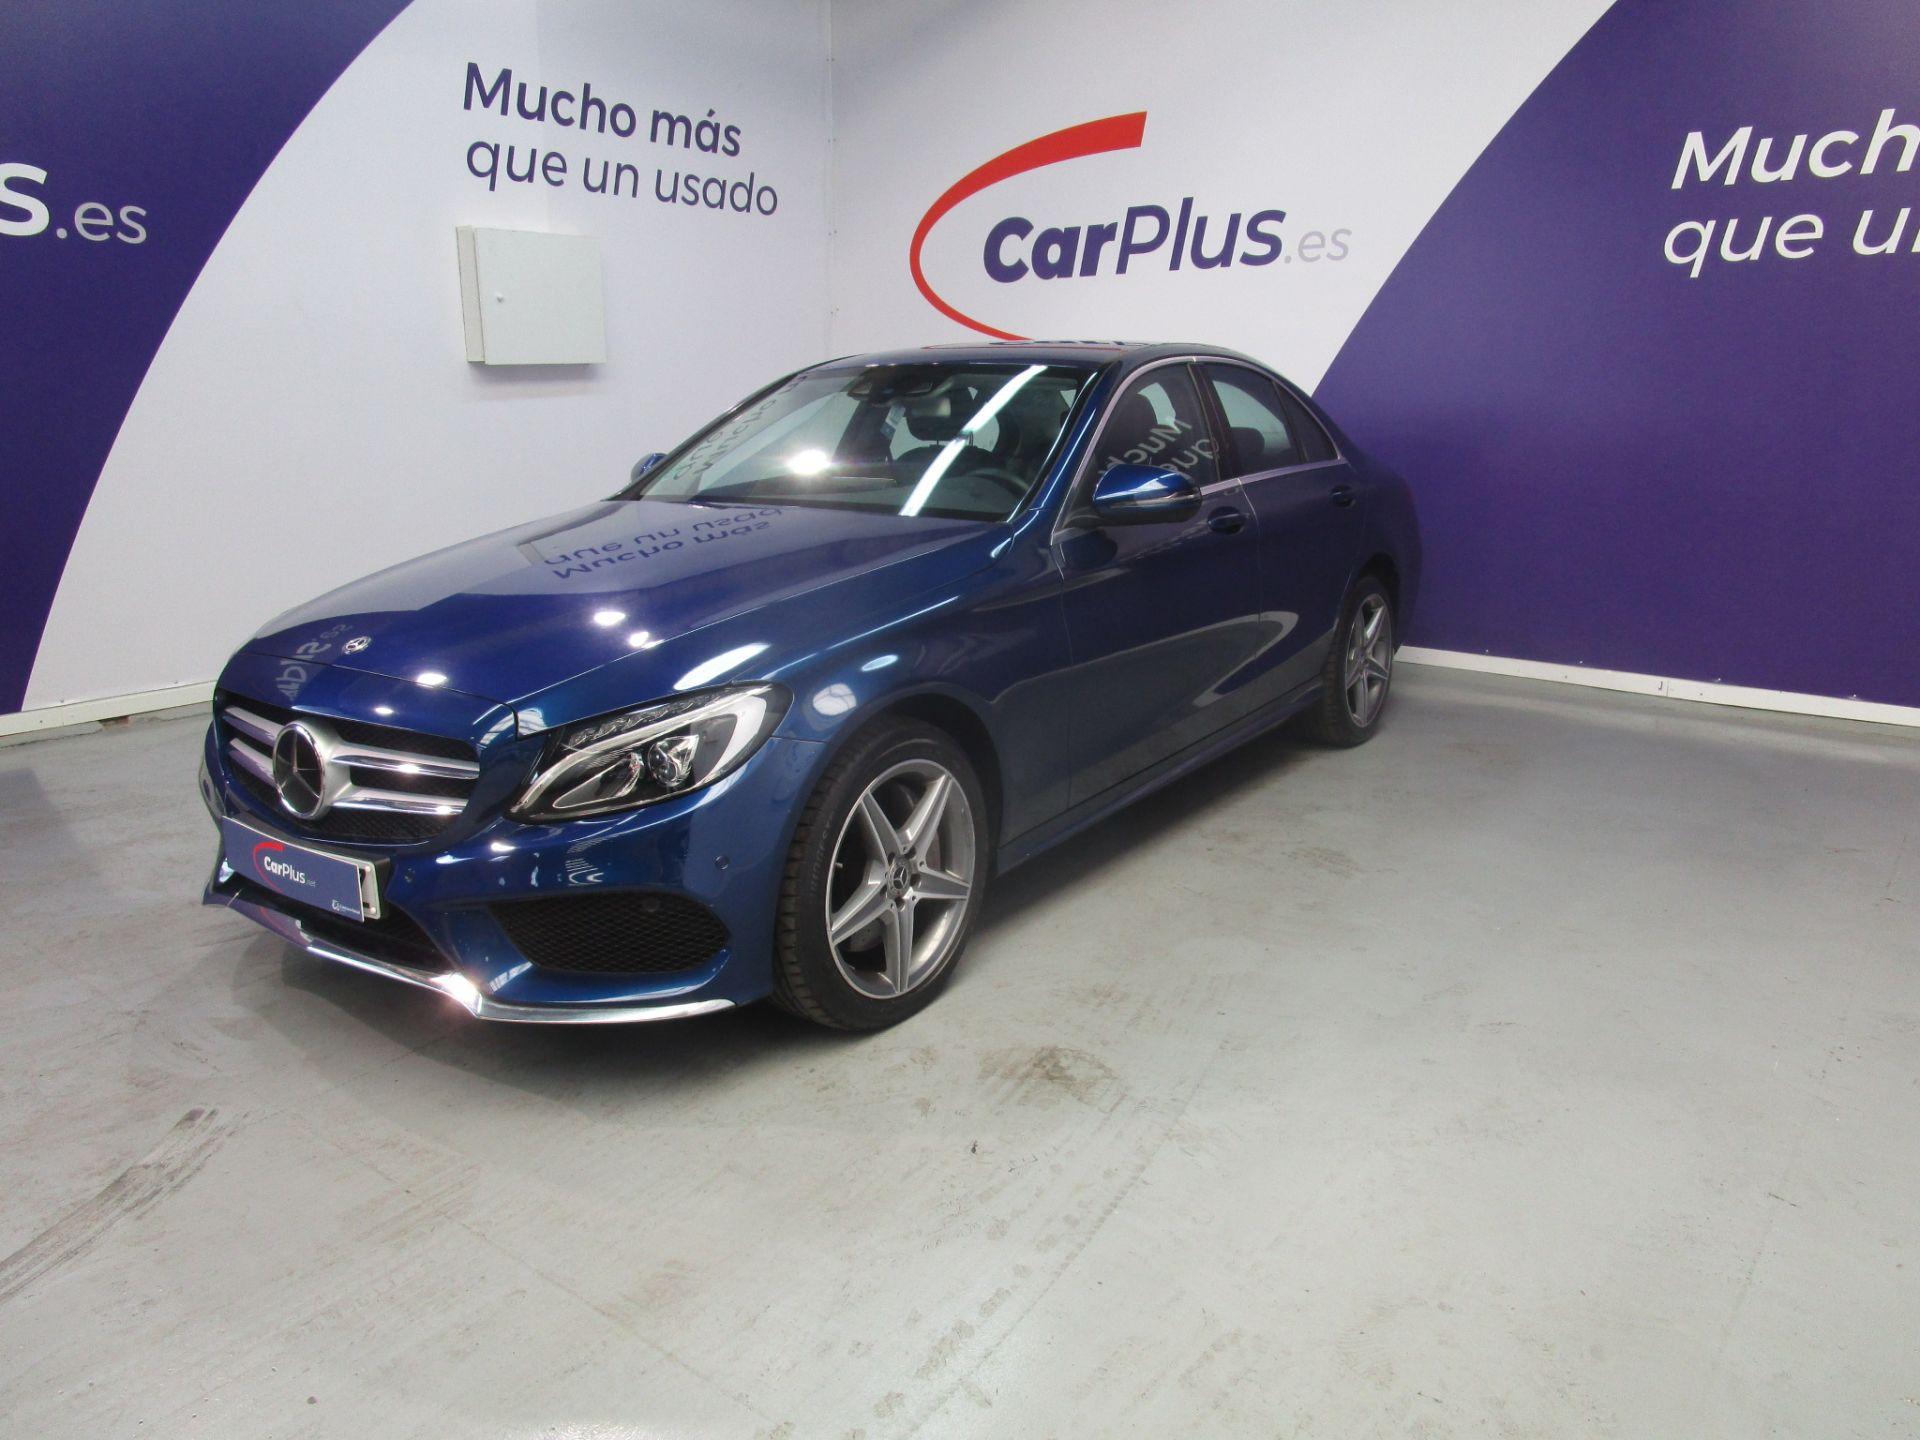 Mercedes Benz Clase C 250 d 4MATIC segunda mano Madrid